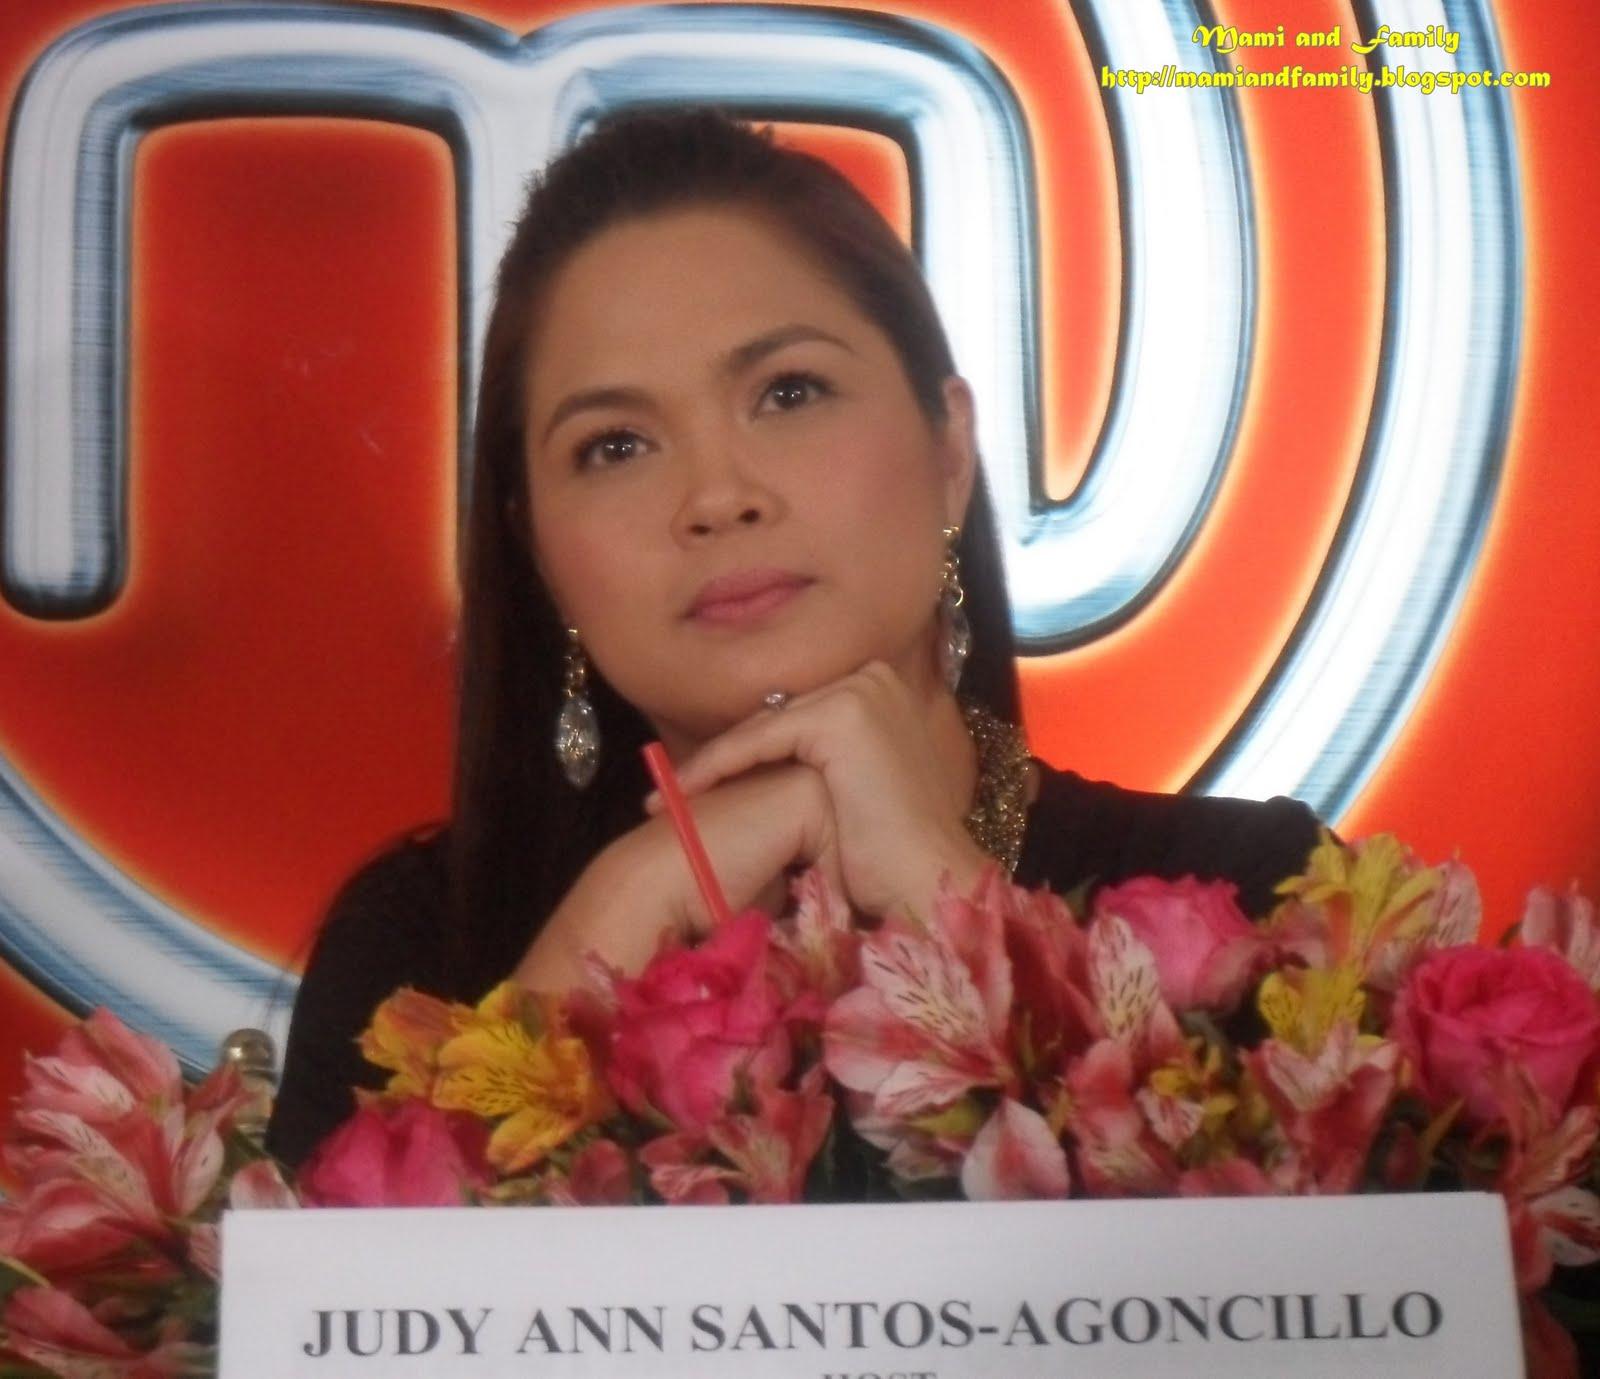 Judy Ann Santos - Wallpaper Image